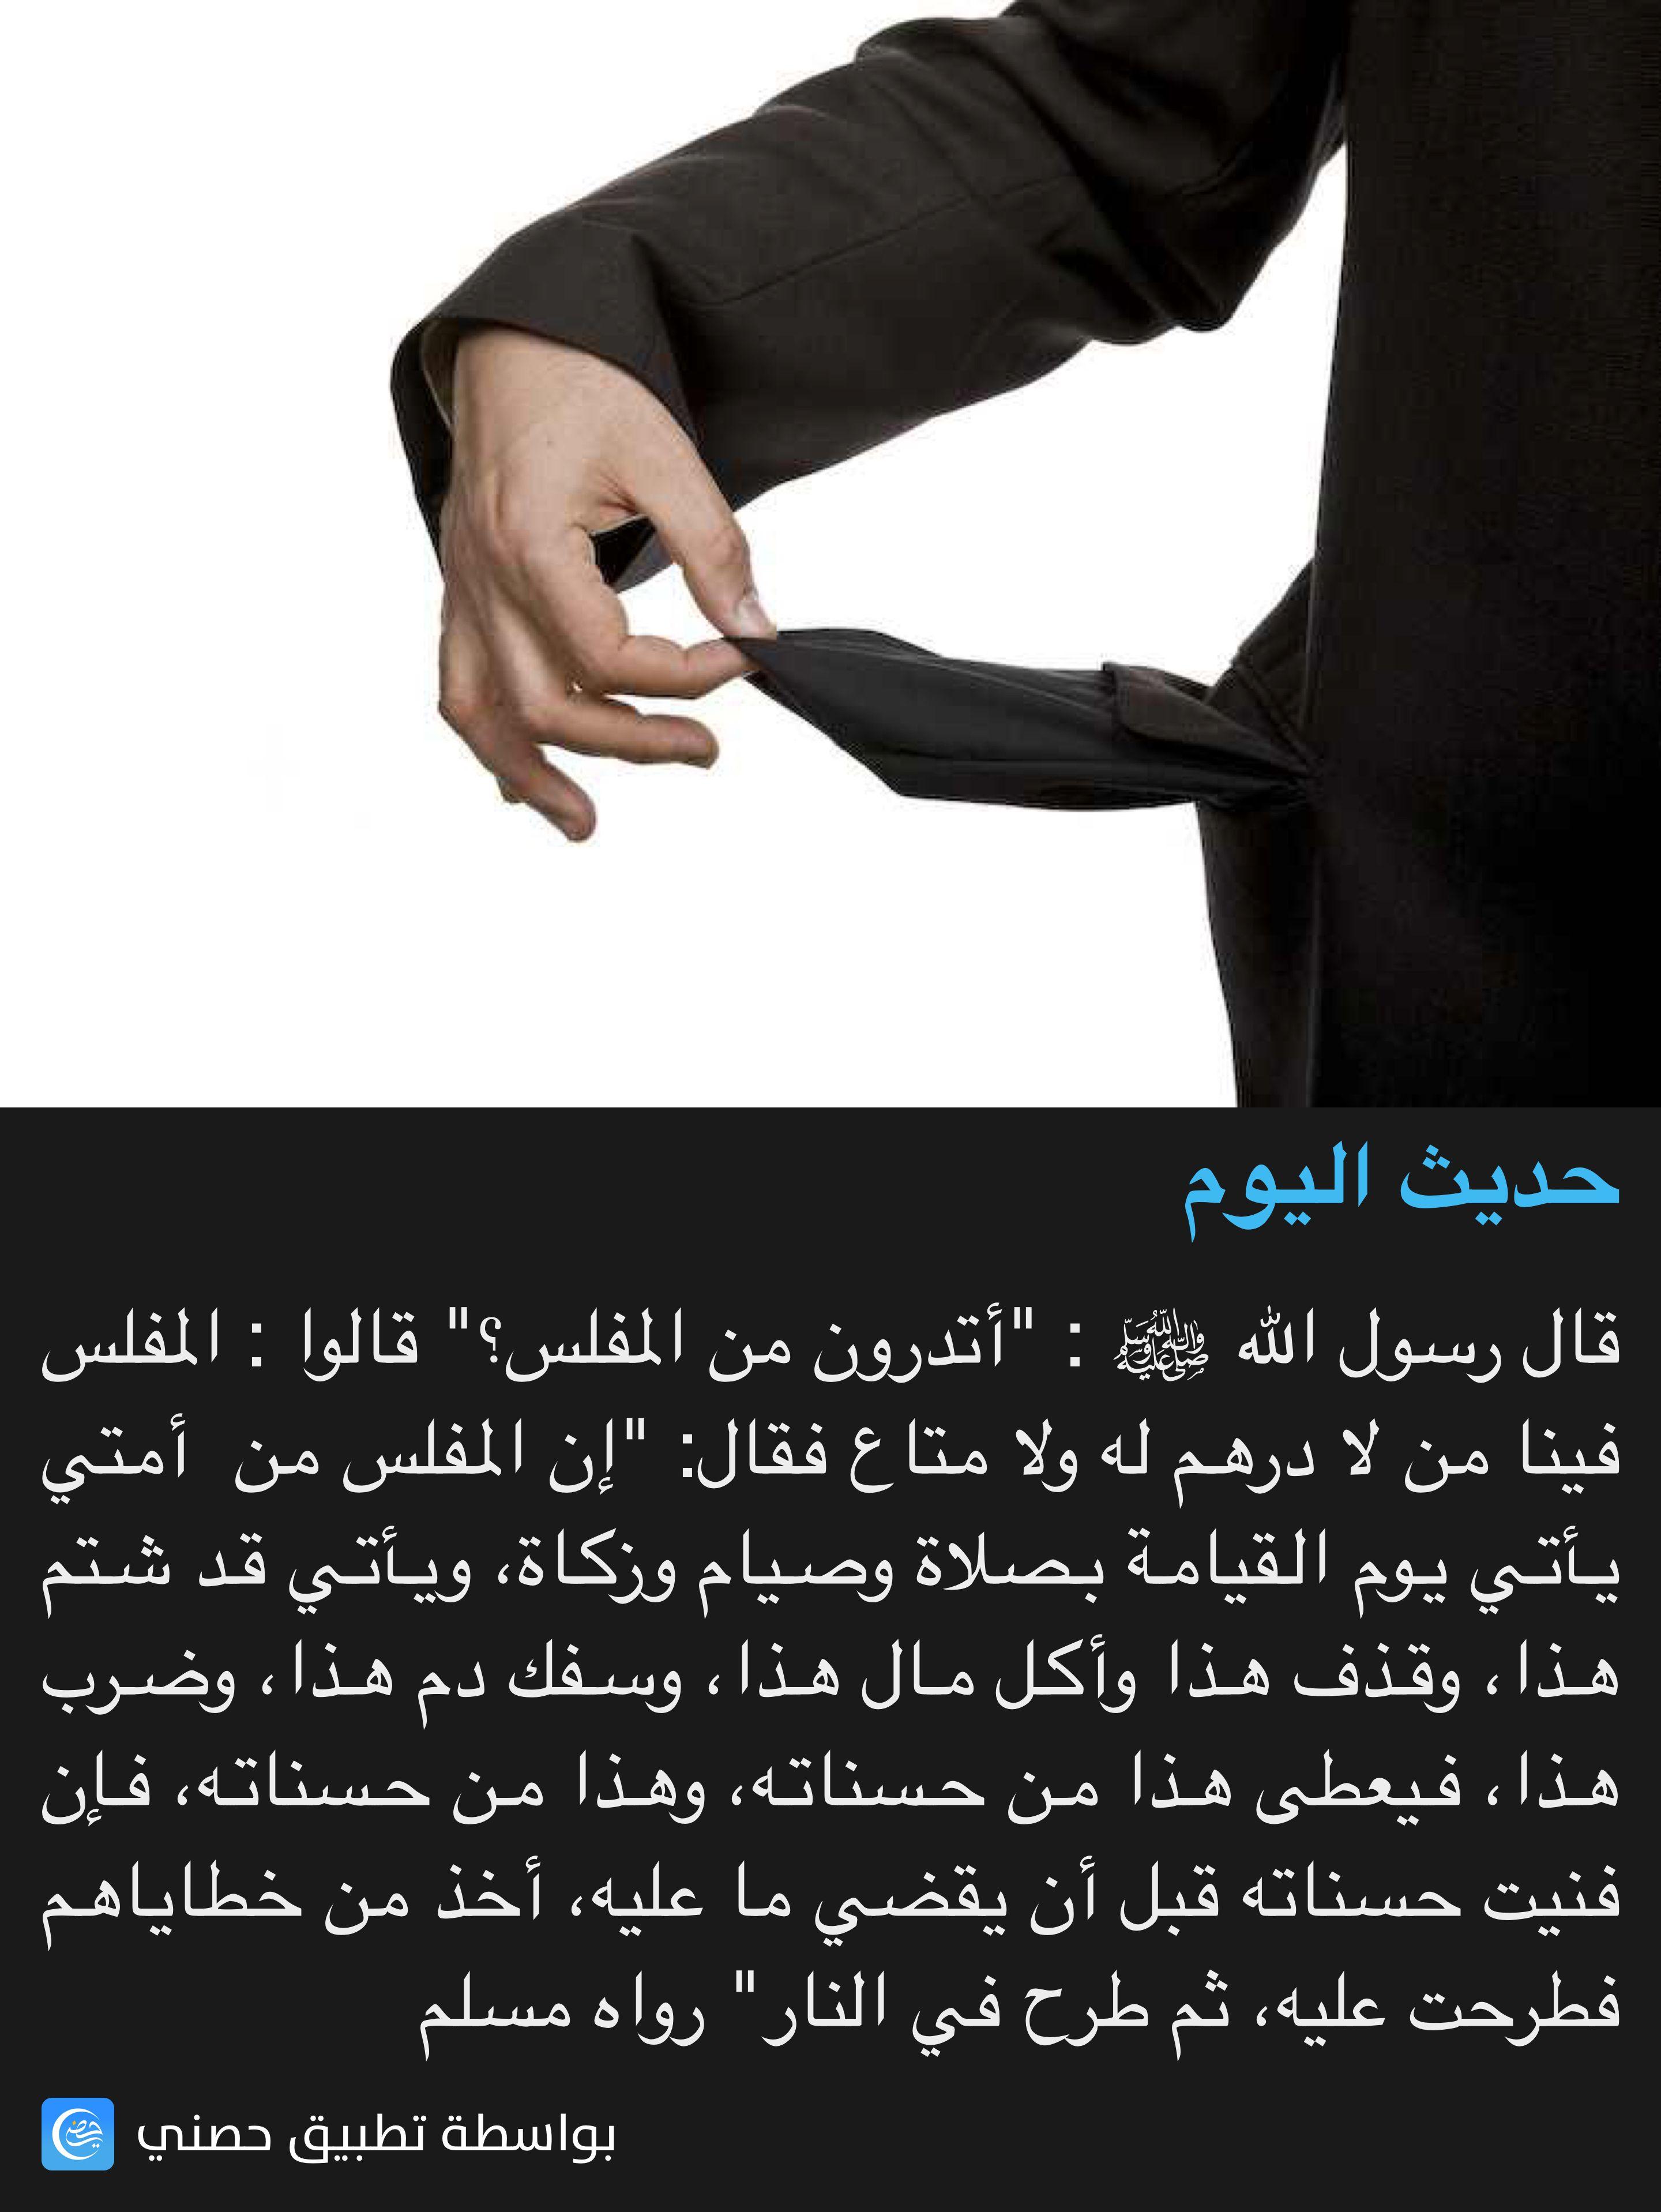 حديث اليوم Islamic Quotes Hadith Islam